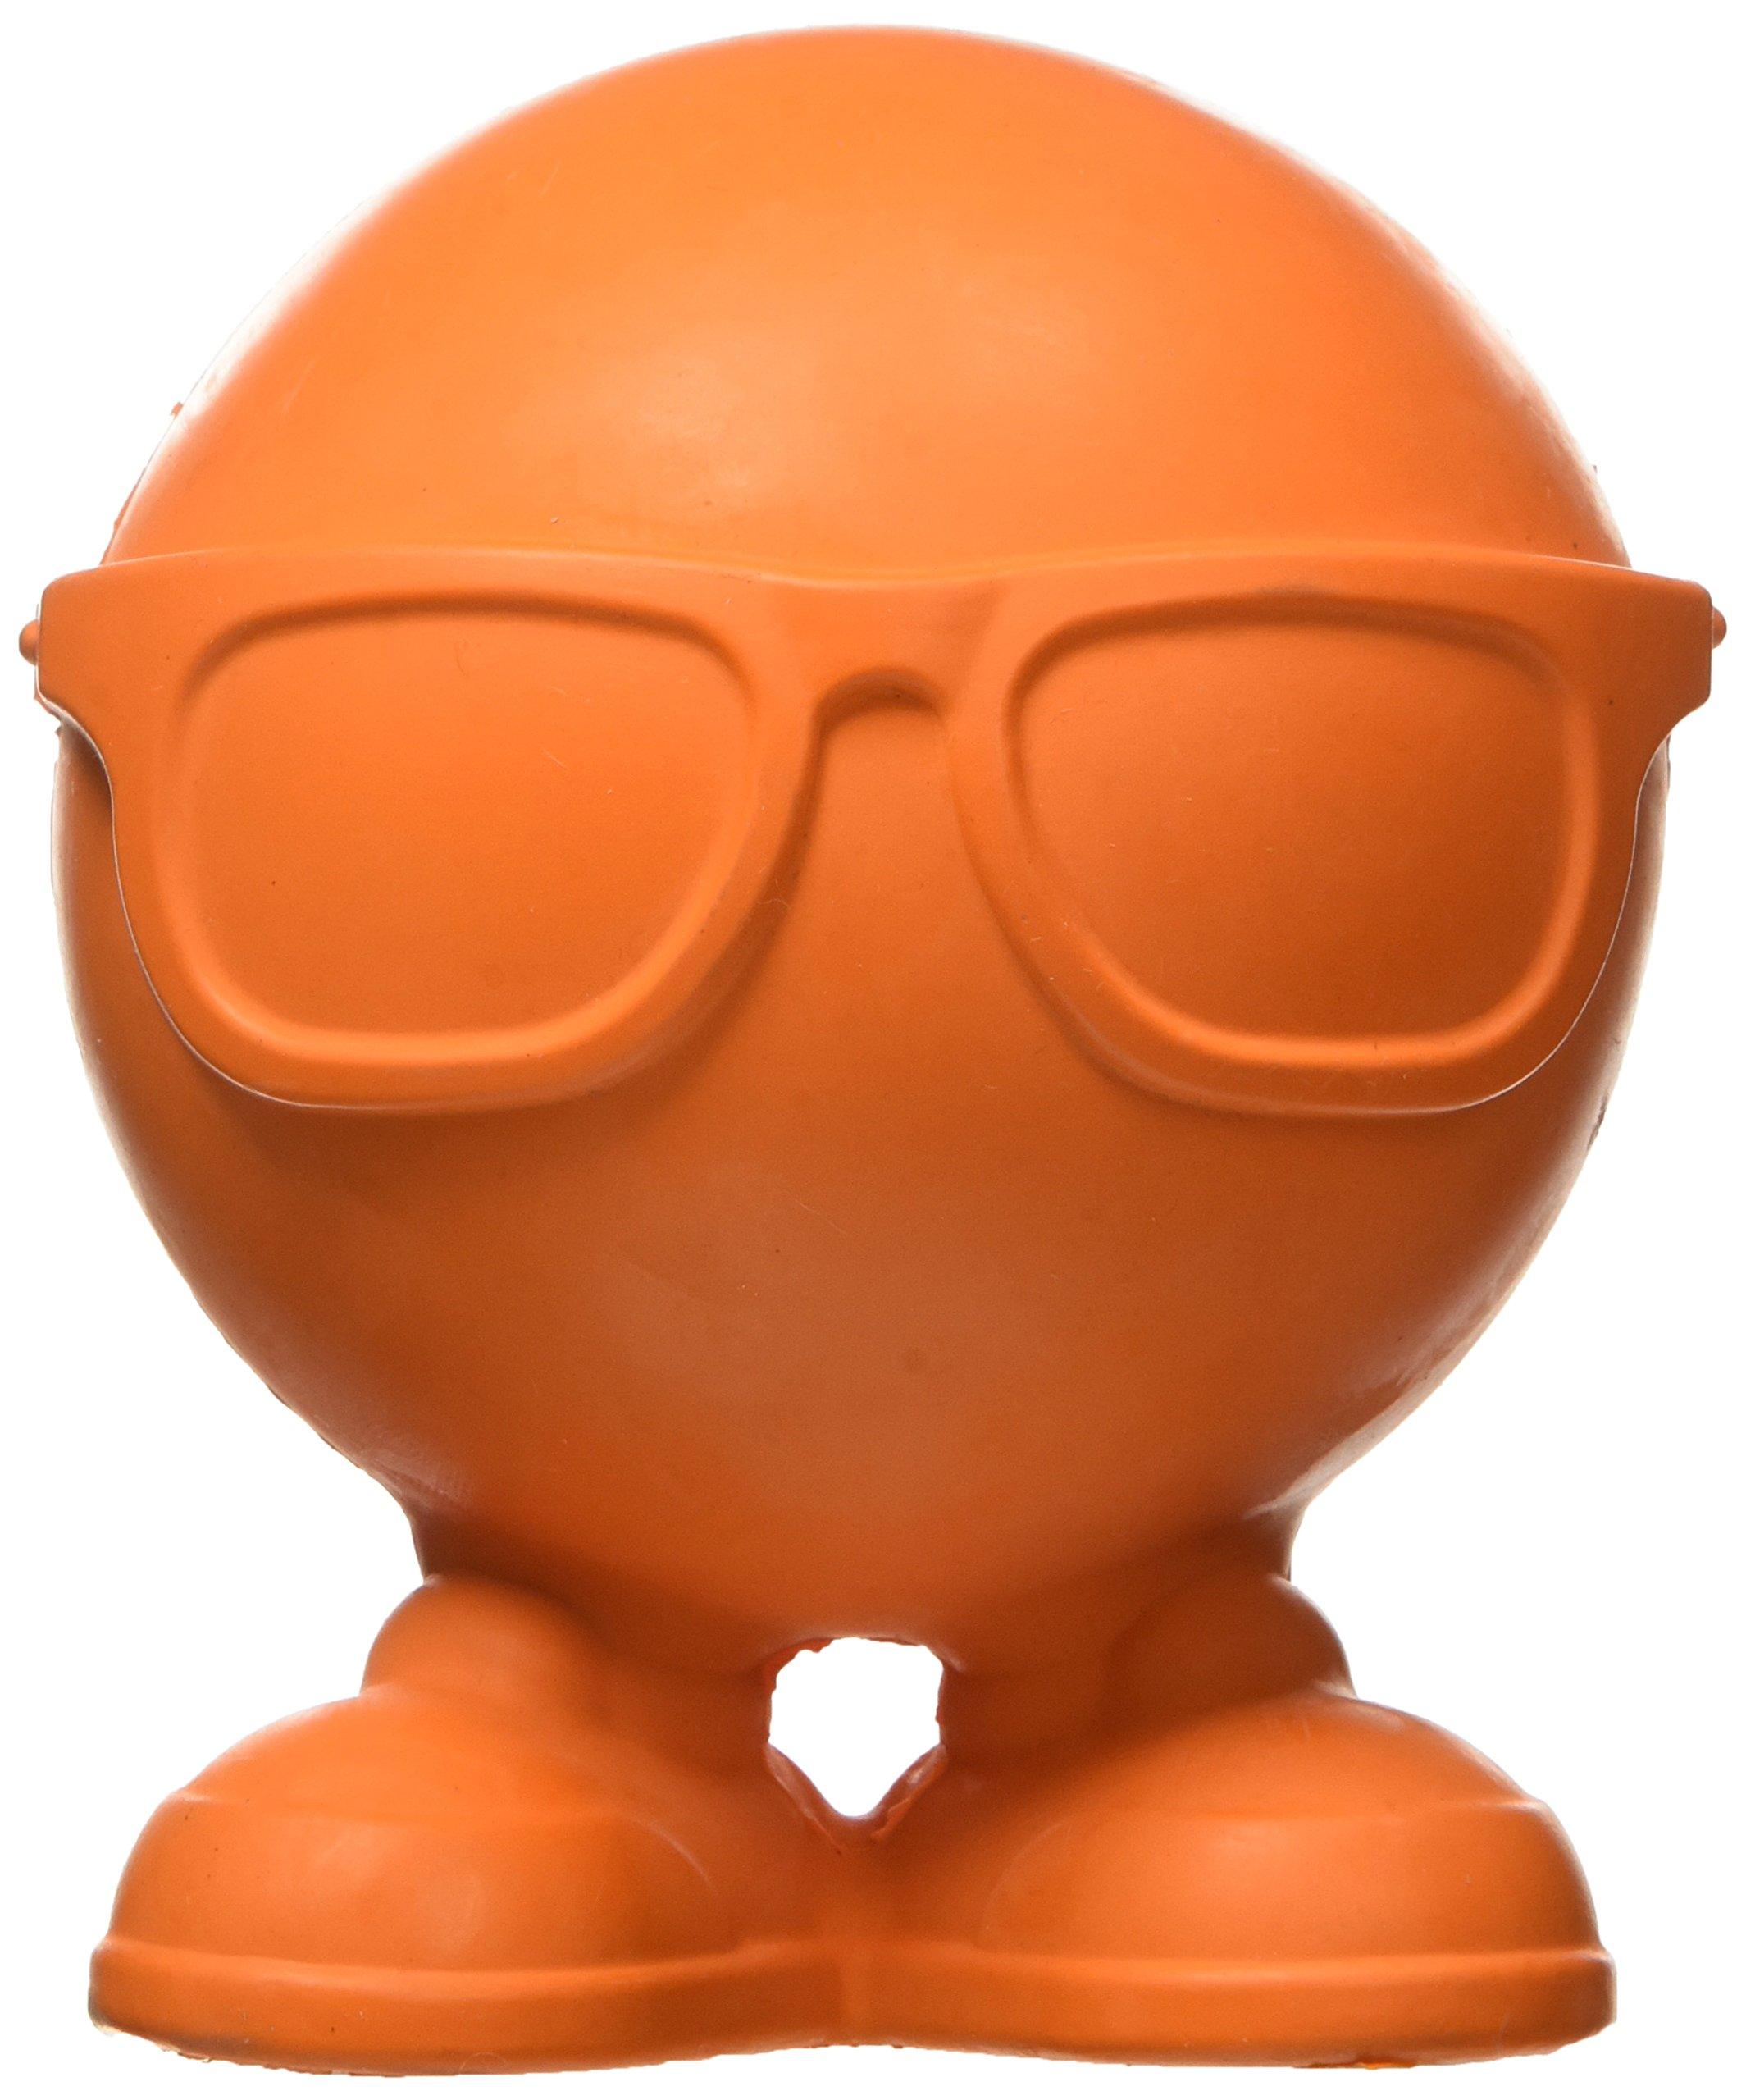 Petmate JW Hipster Cuz Assistant Toy, Large, Multicolor